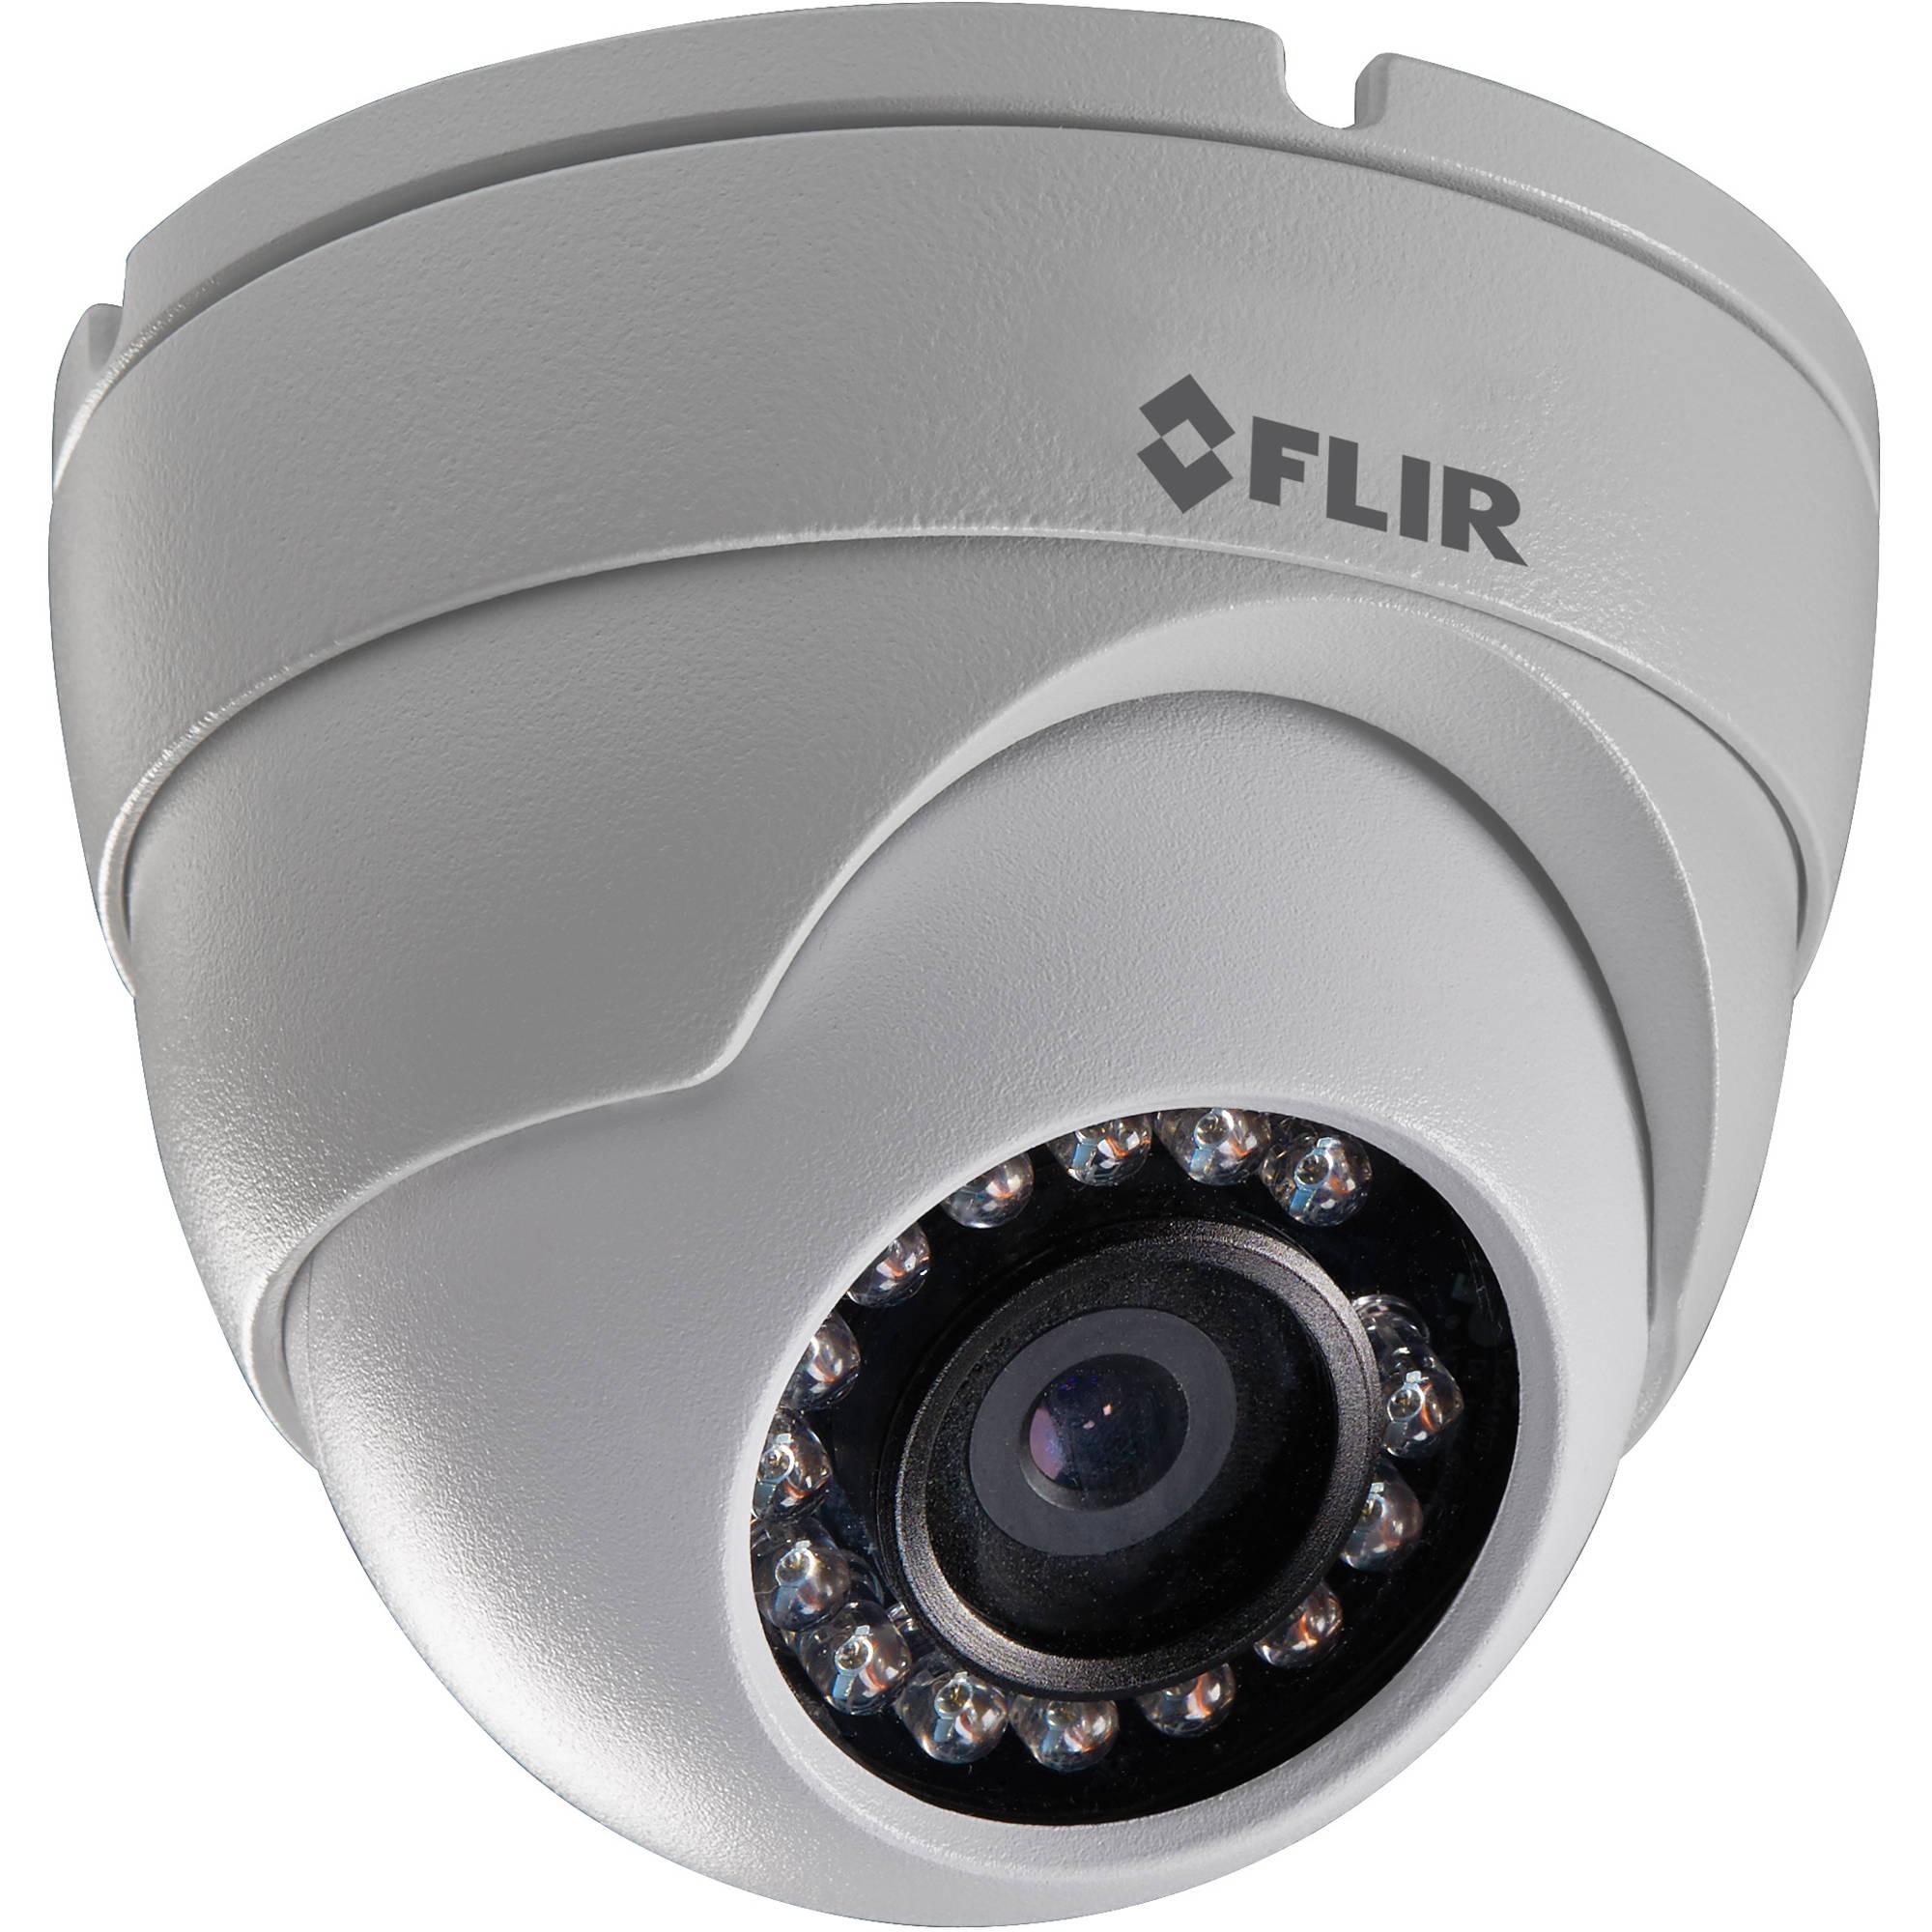 FLIR 1MP Outdoor Dome Camera N133EB B&H Photo Video